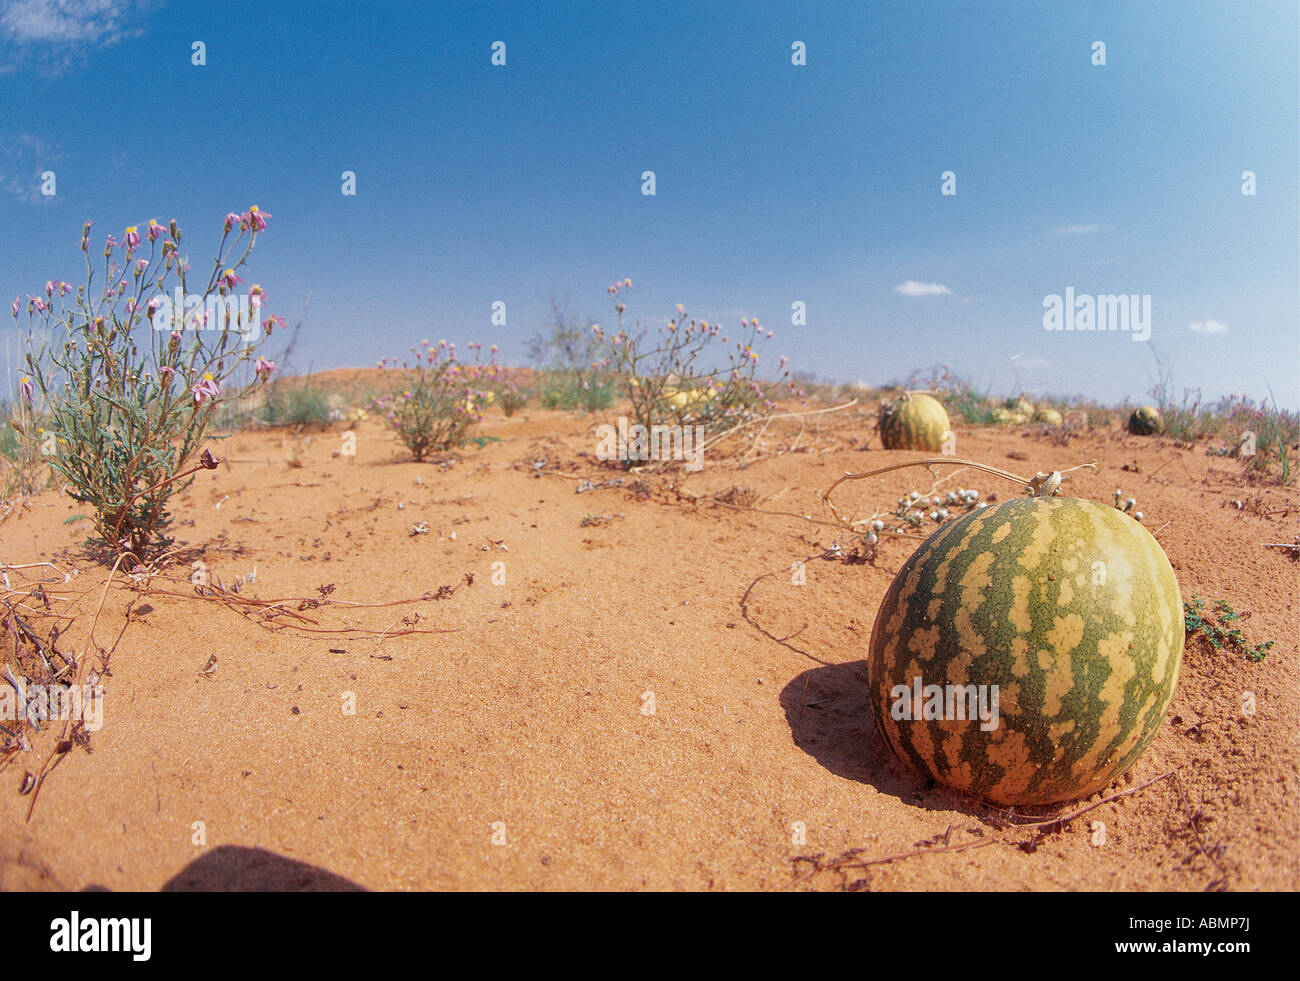 Isamma melon provides moisture for animals in dry season Kalahari Gemsbok National Park North Cape South Africa - Stock Image